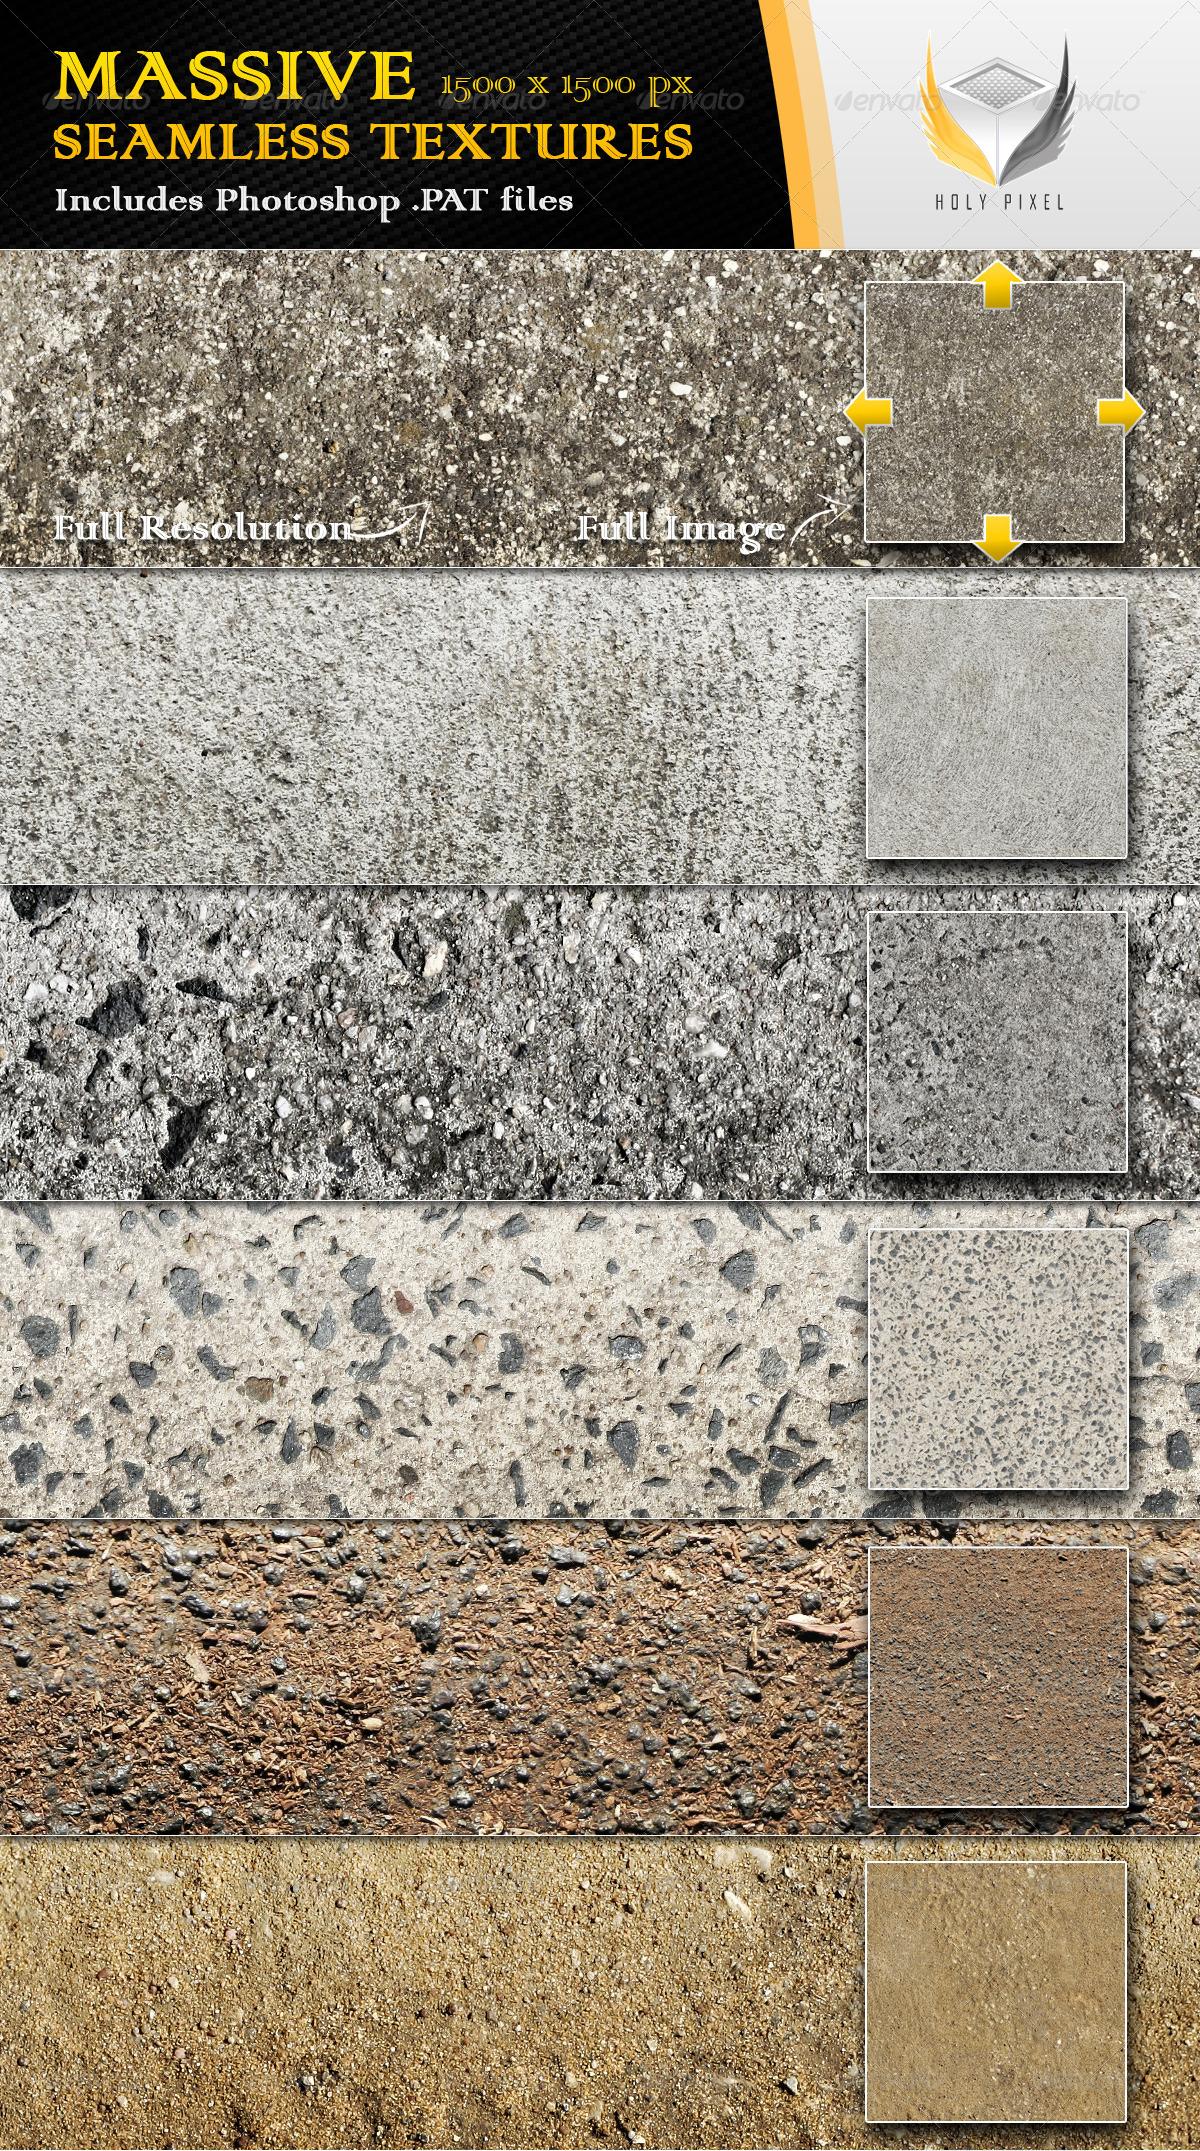 6 Seamless Concrete Textures - Urban Textures / Fills / Patterns